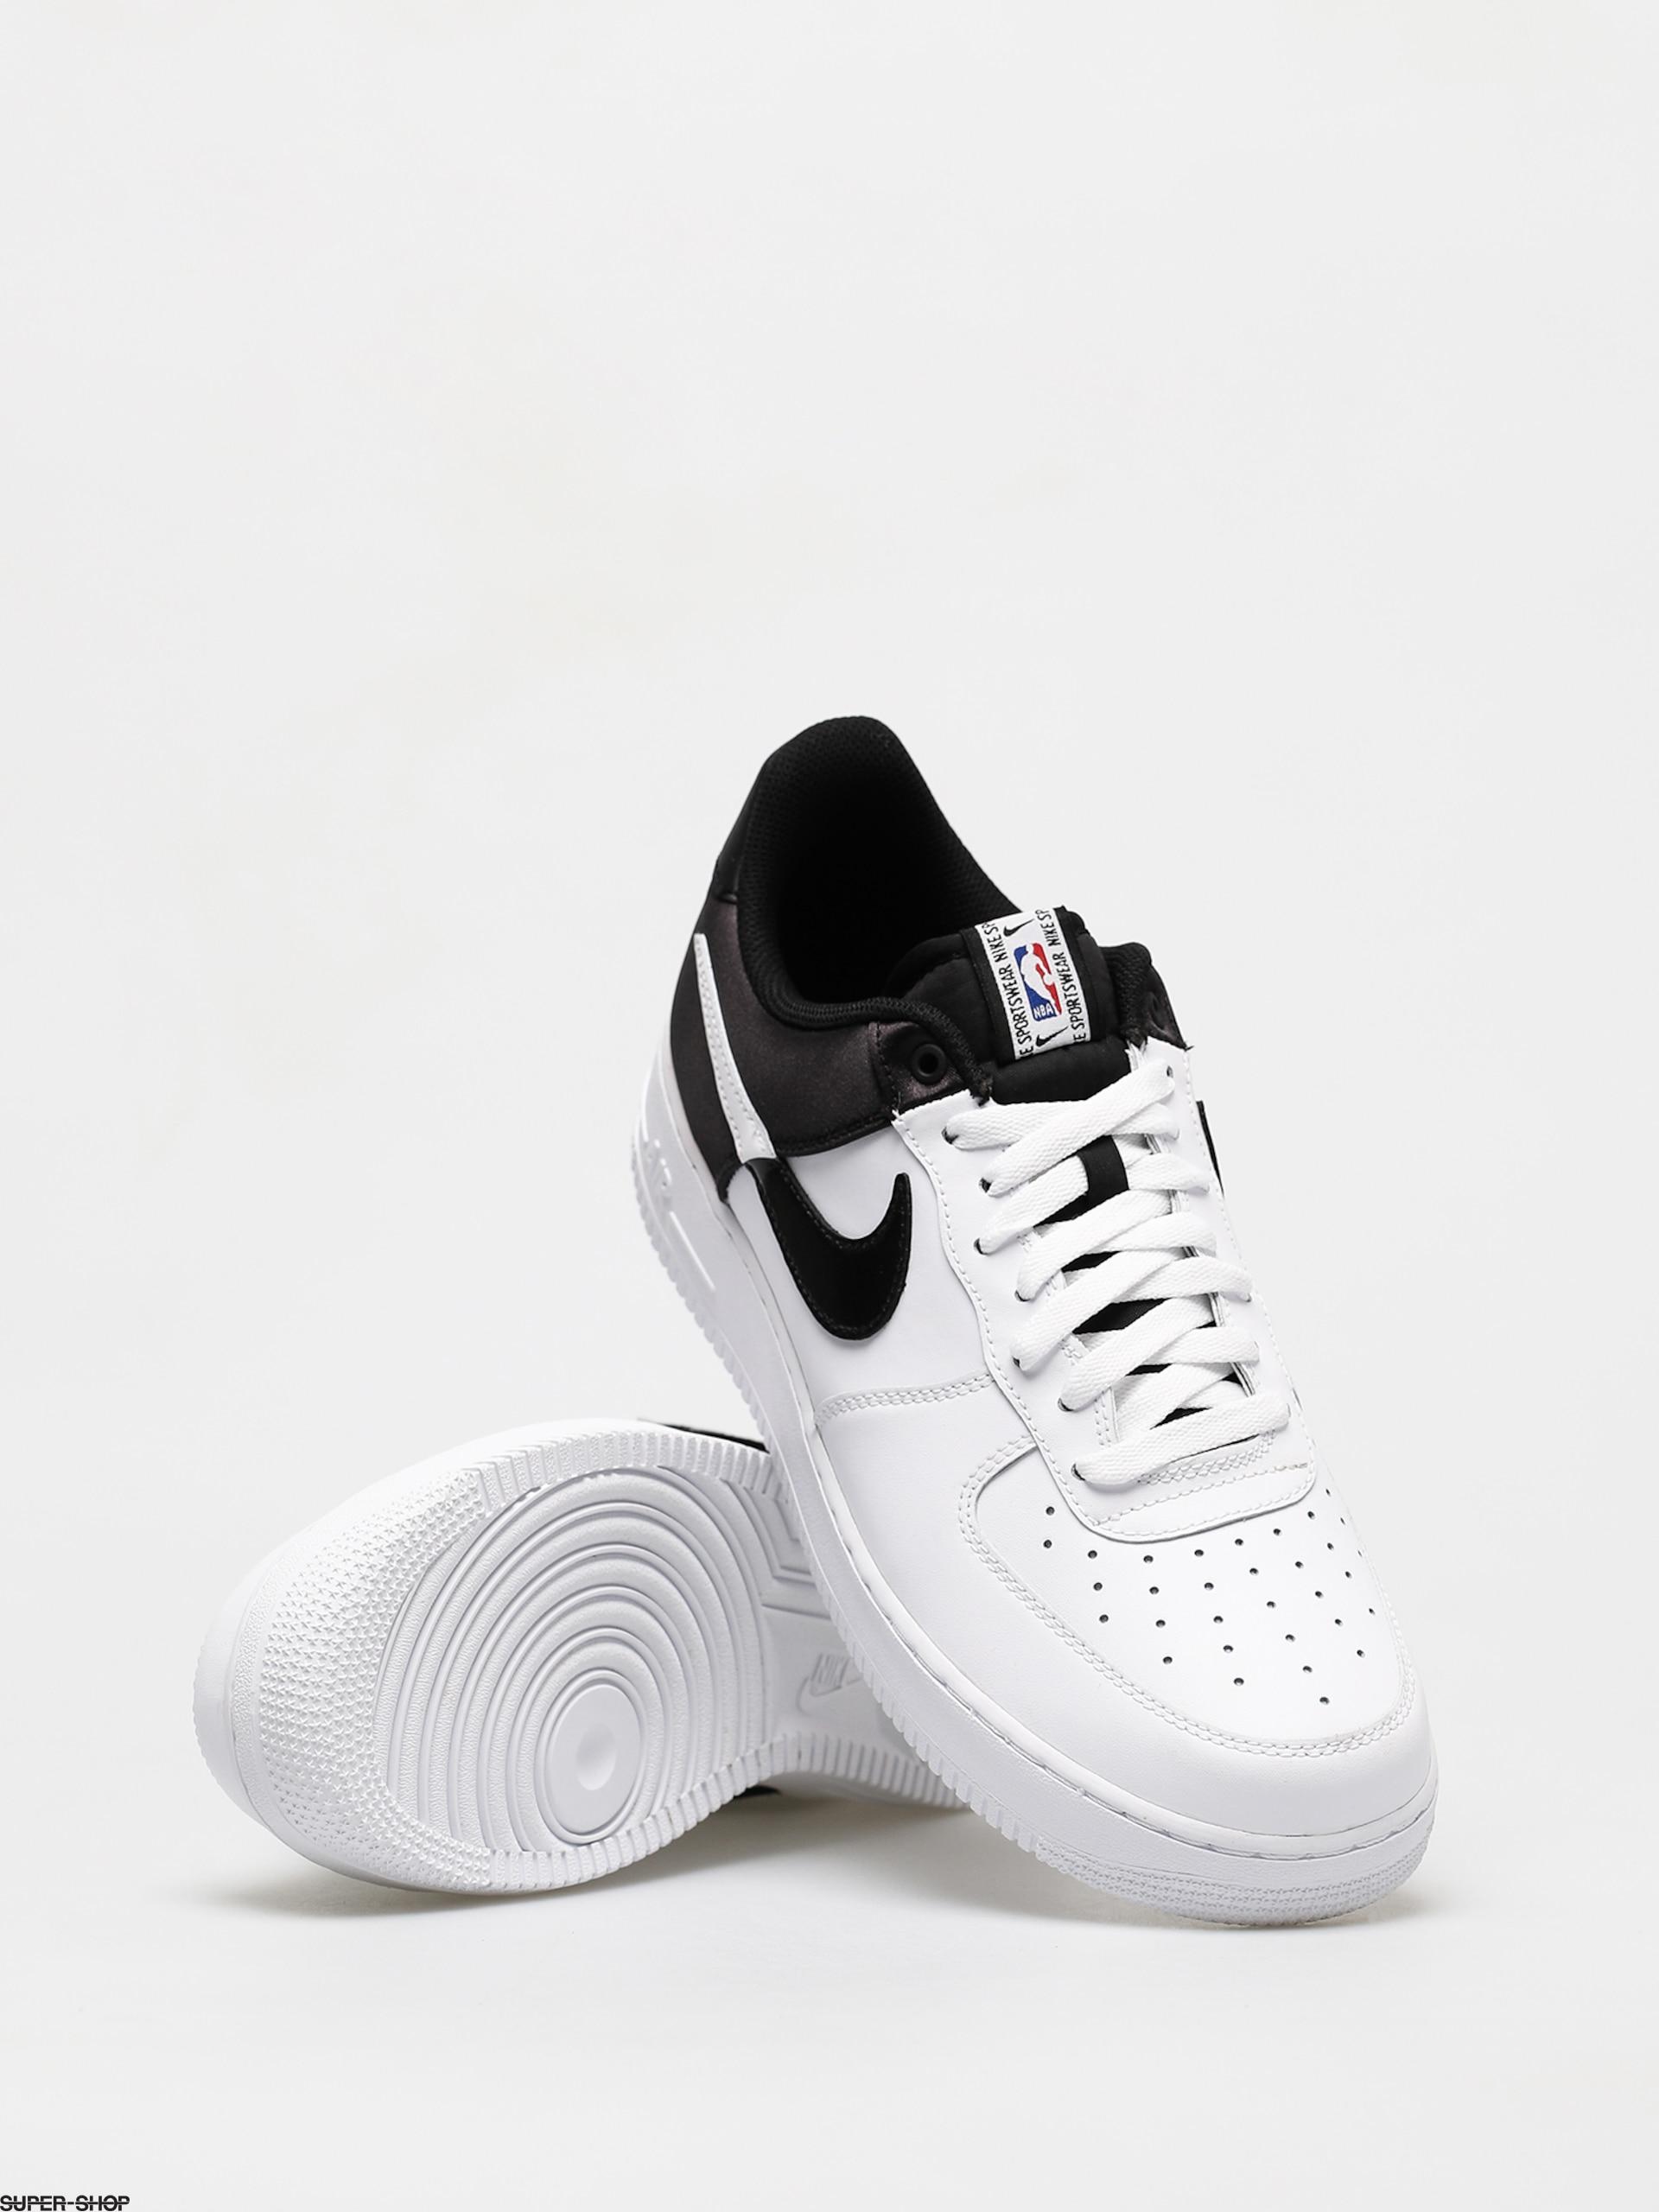 Nike Air Force 1 07 Lv8 1 Shoes (whiteblack white)